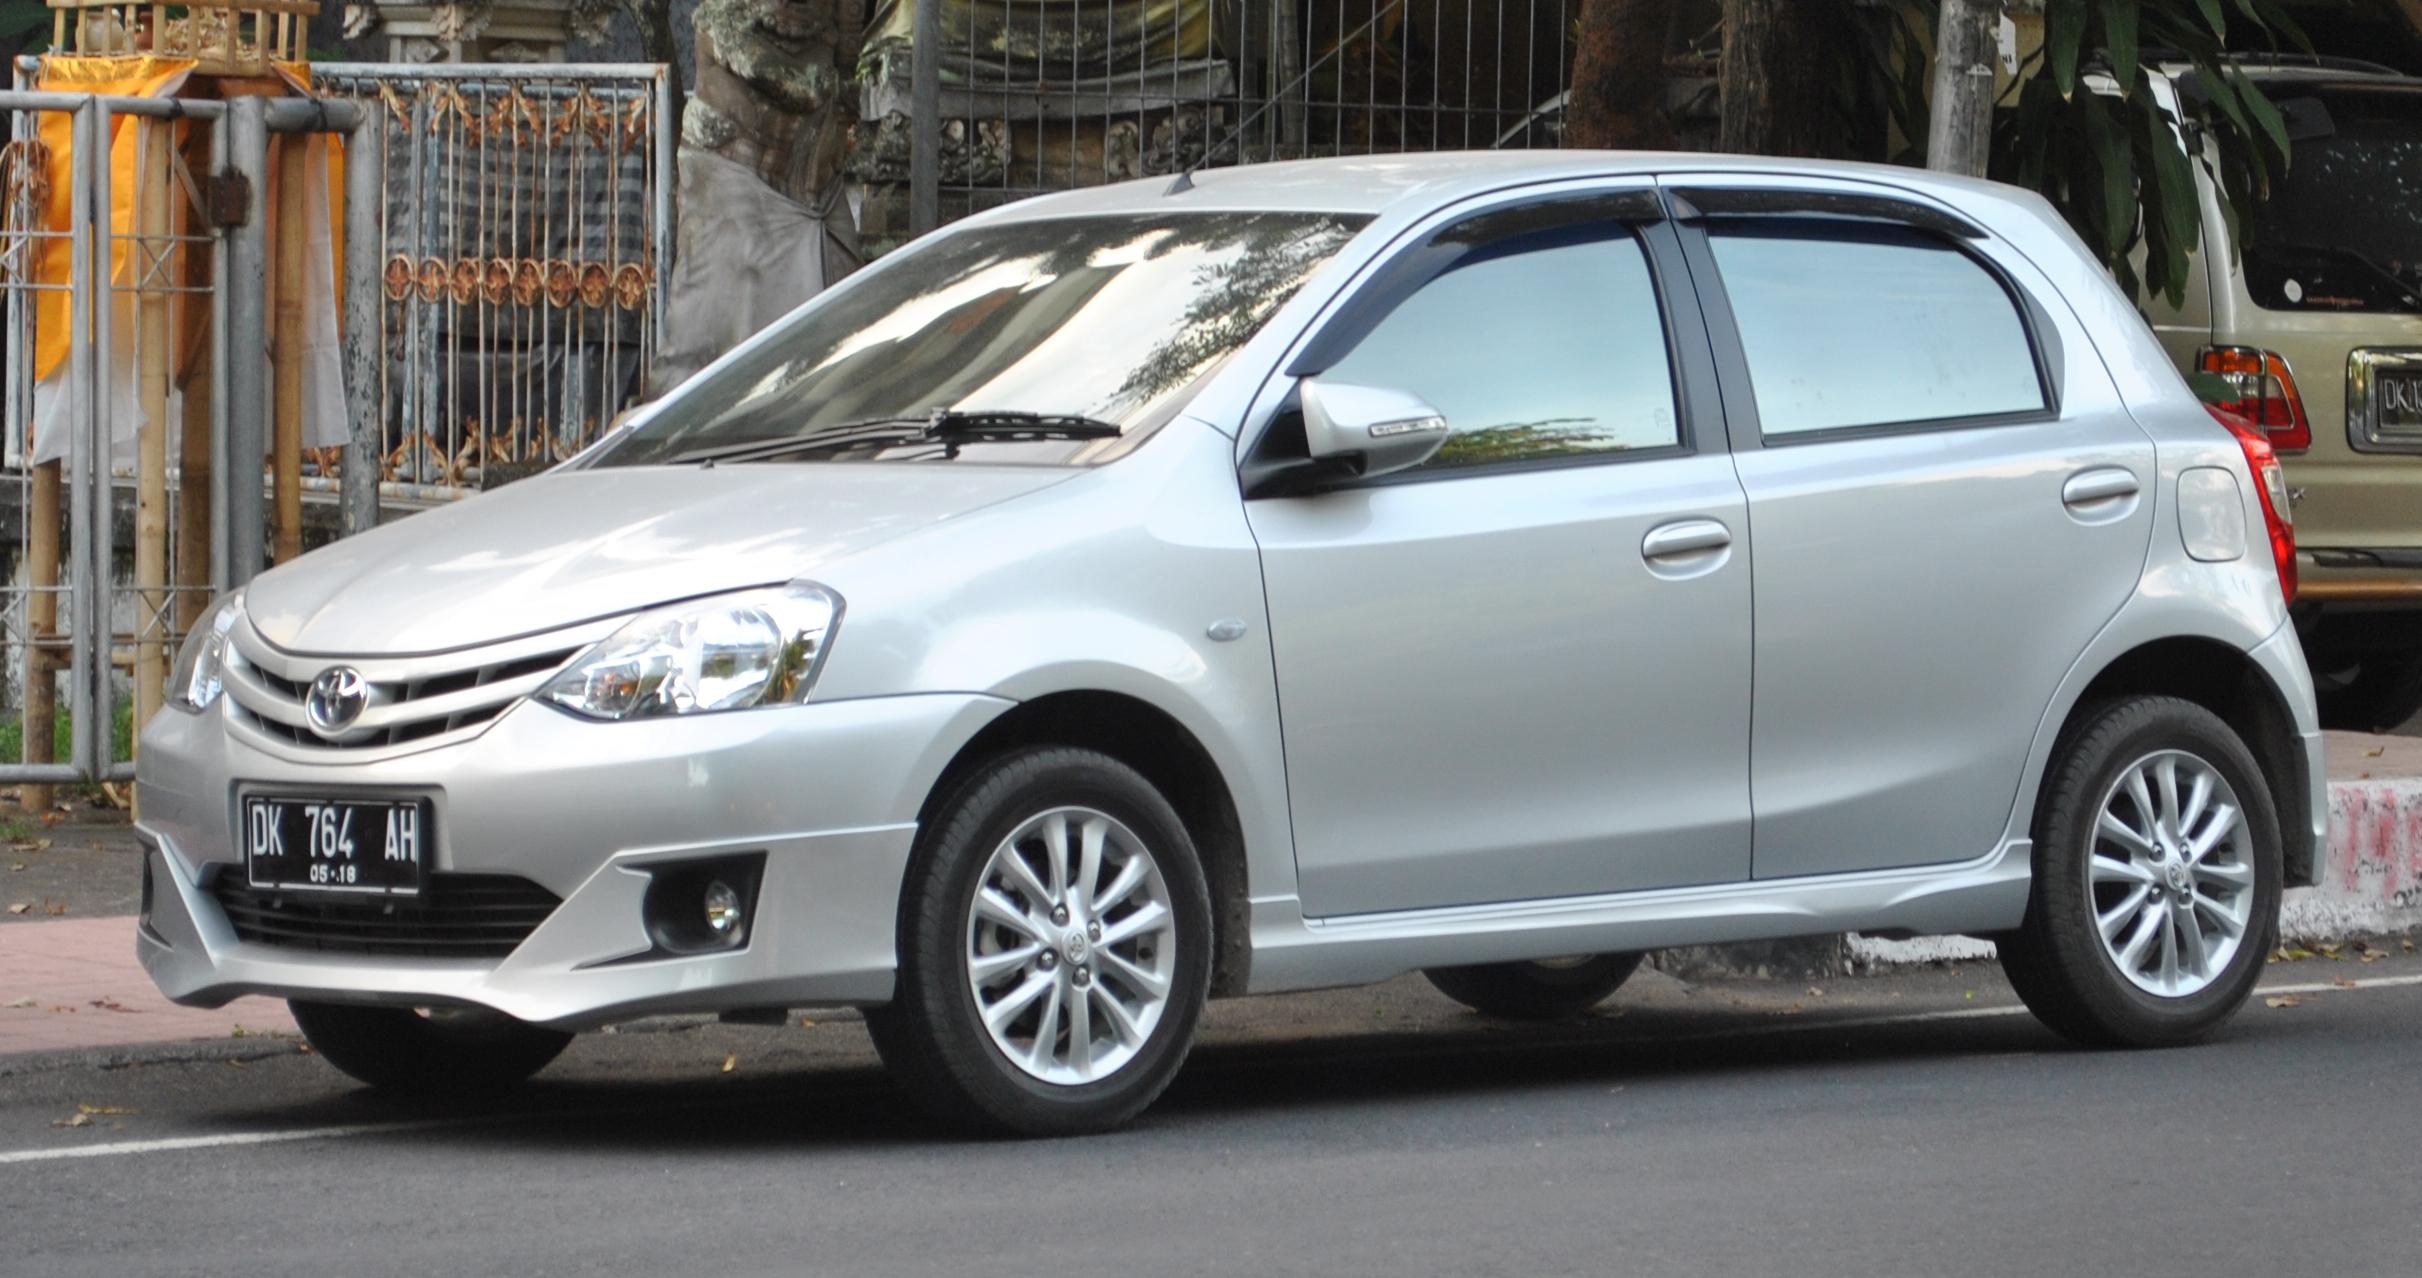 File:Toyota Etios Valco aka Etios Liva (front).JPG - Wikimedia Commons